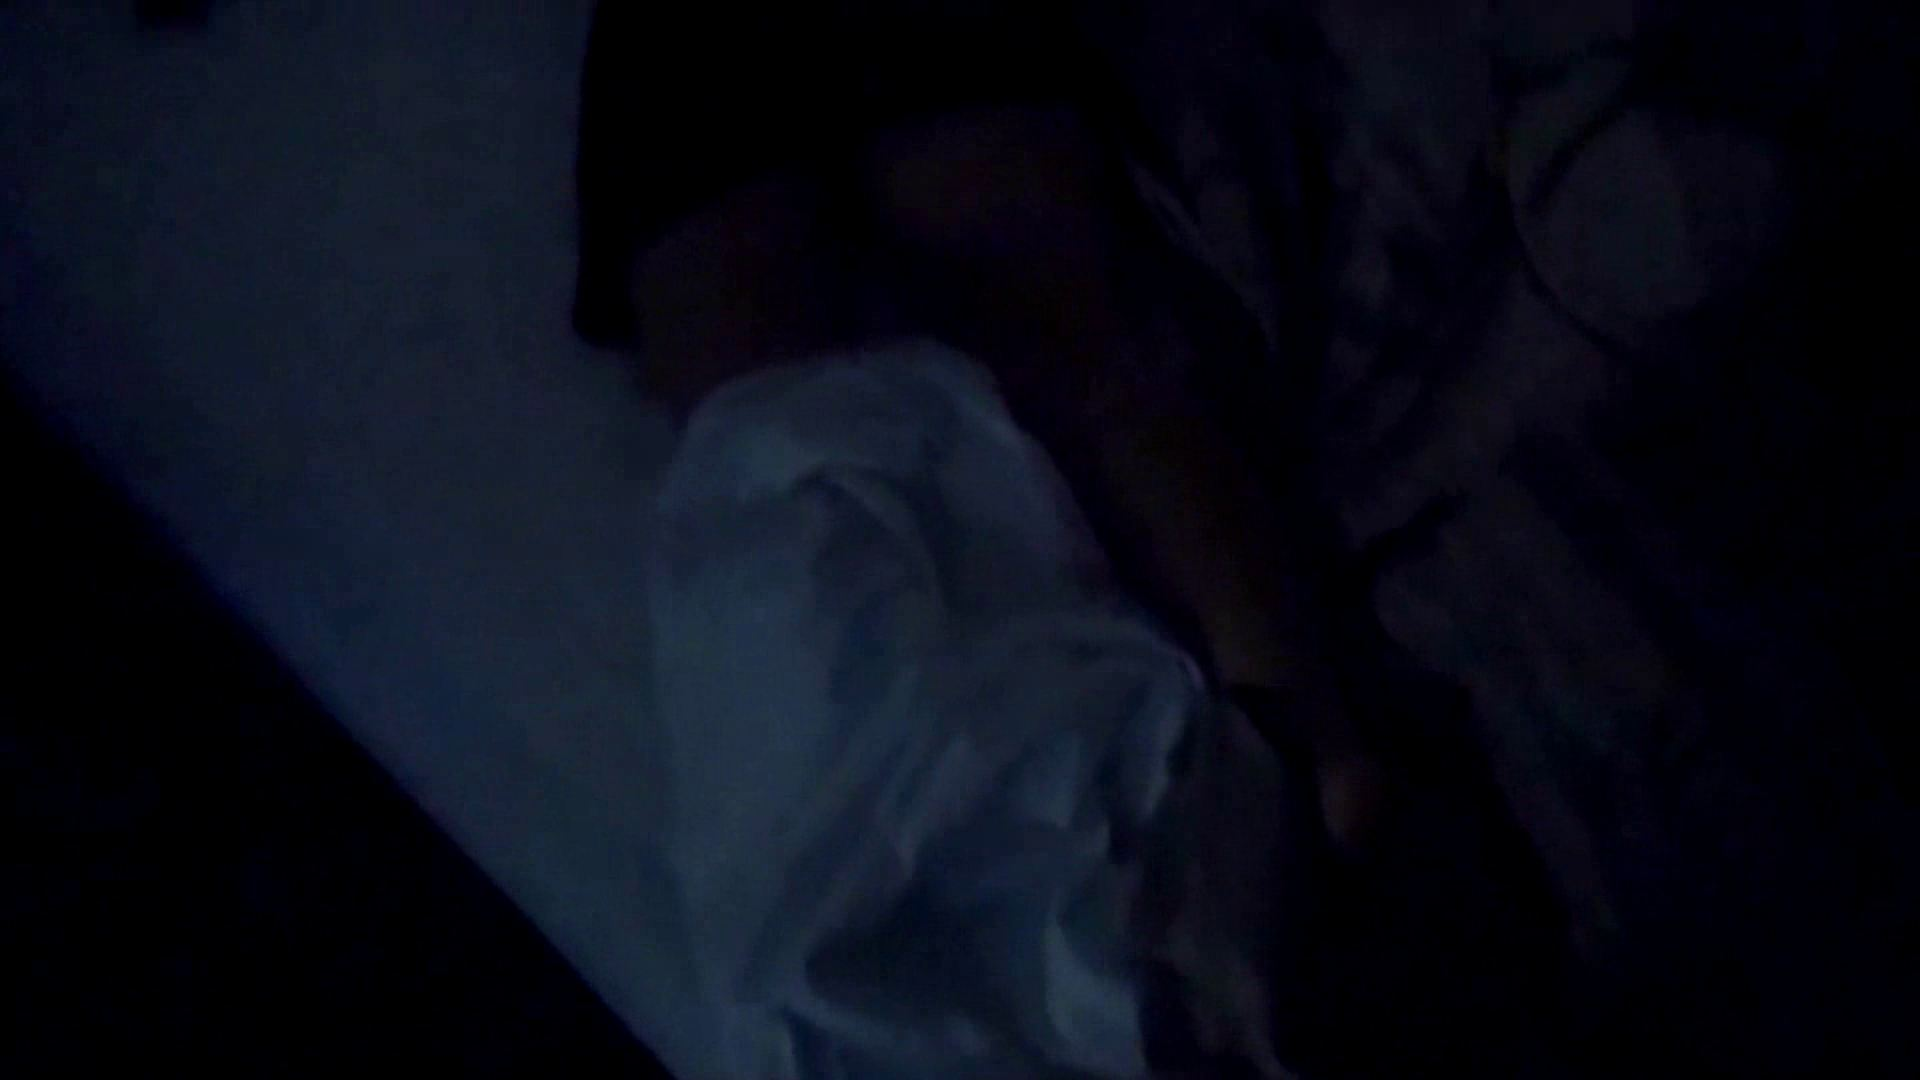 vol.33 【H・Kちゃん】 セクシー系ギャル現役JD 1回目 ギャル攻め  84画像 4